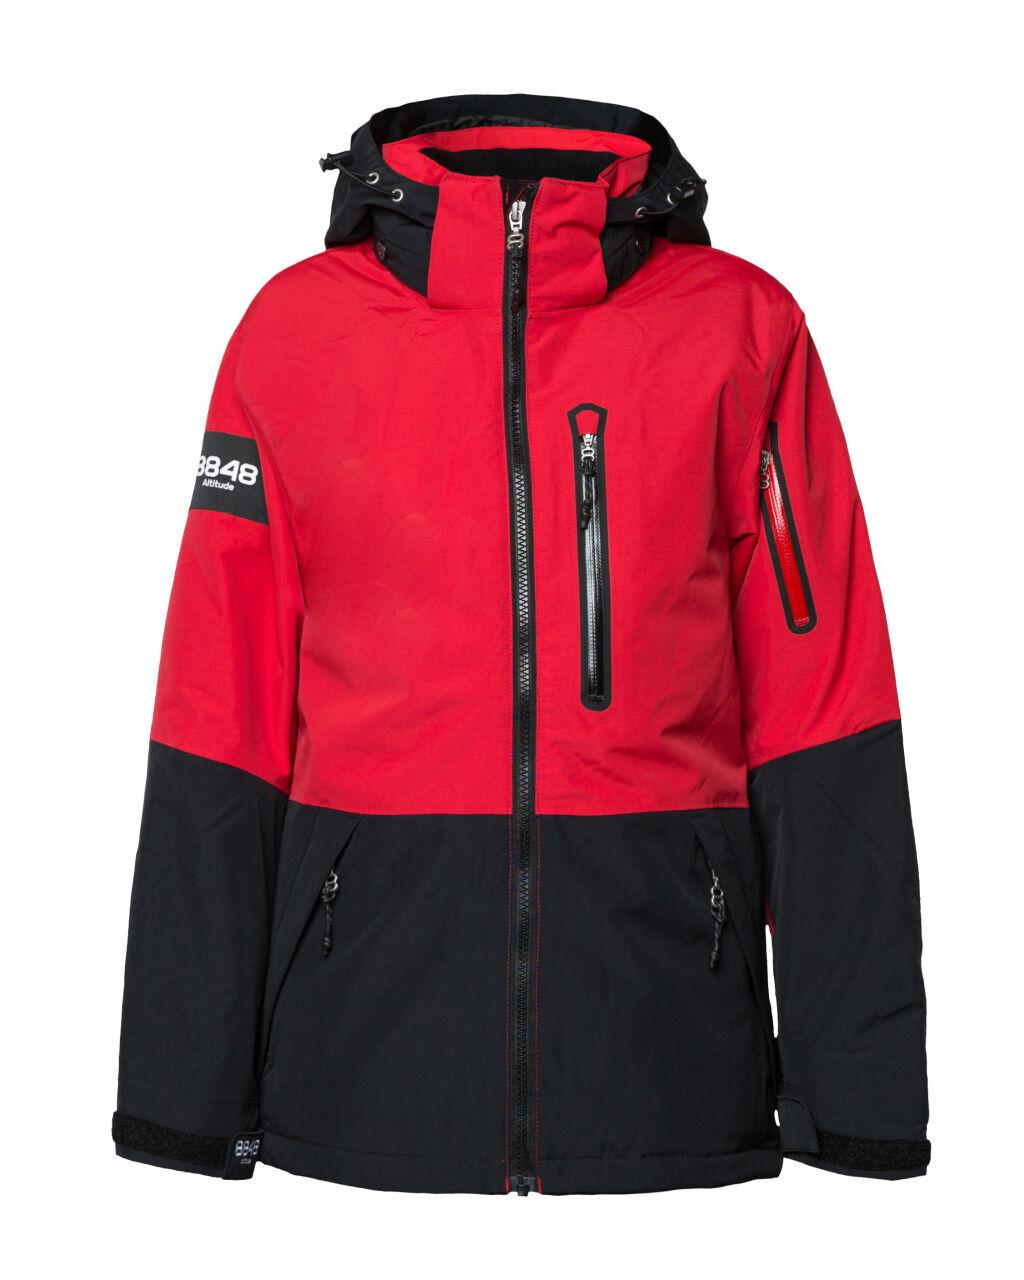 8848 Altitude Kaman jacket jrToppatakki